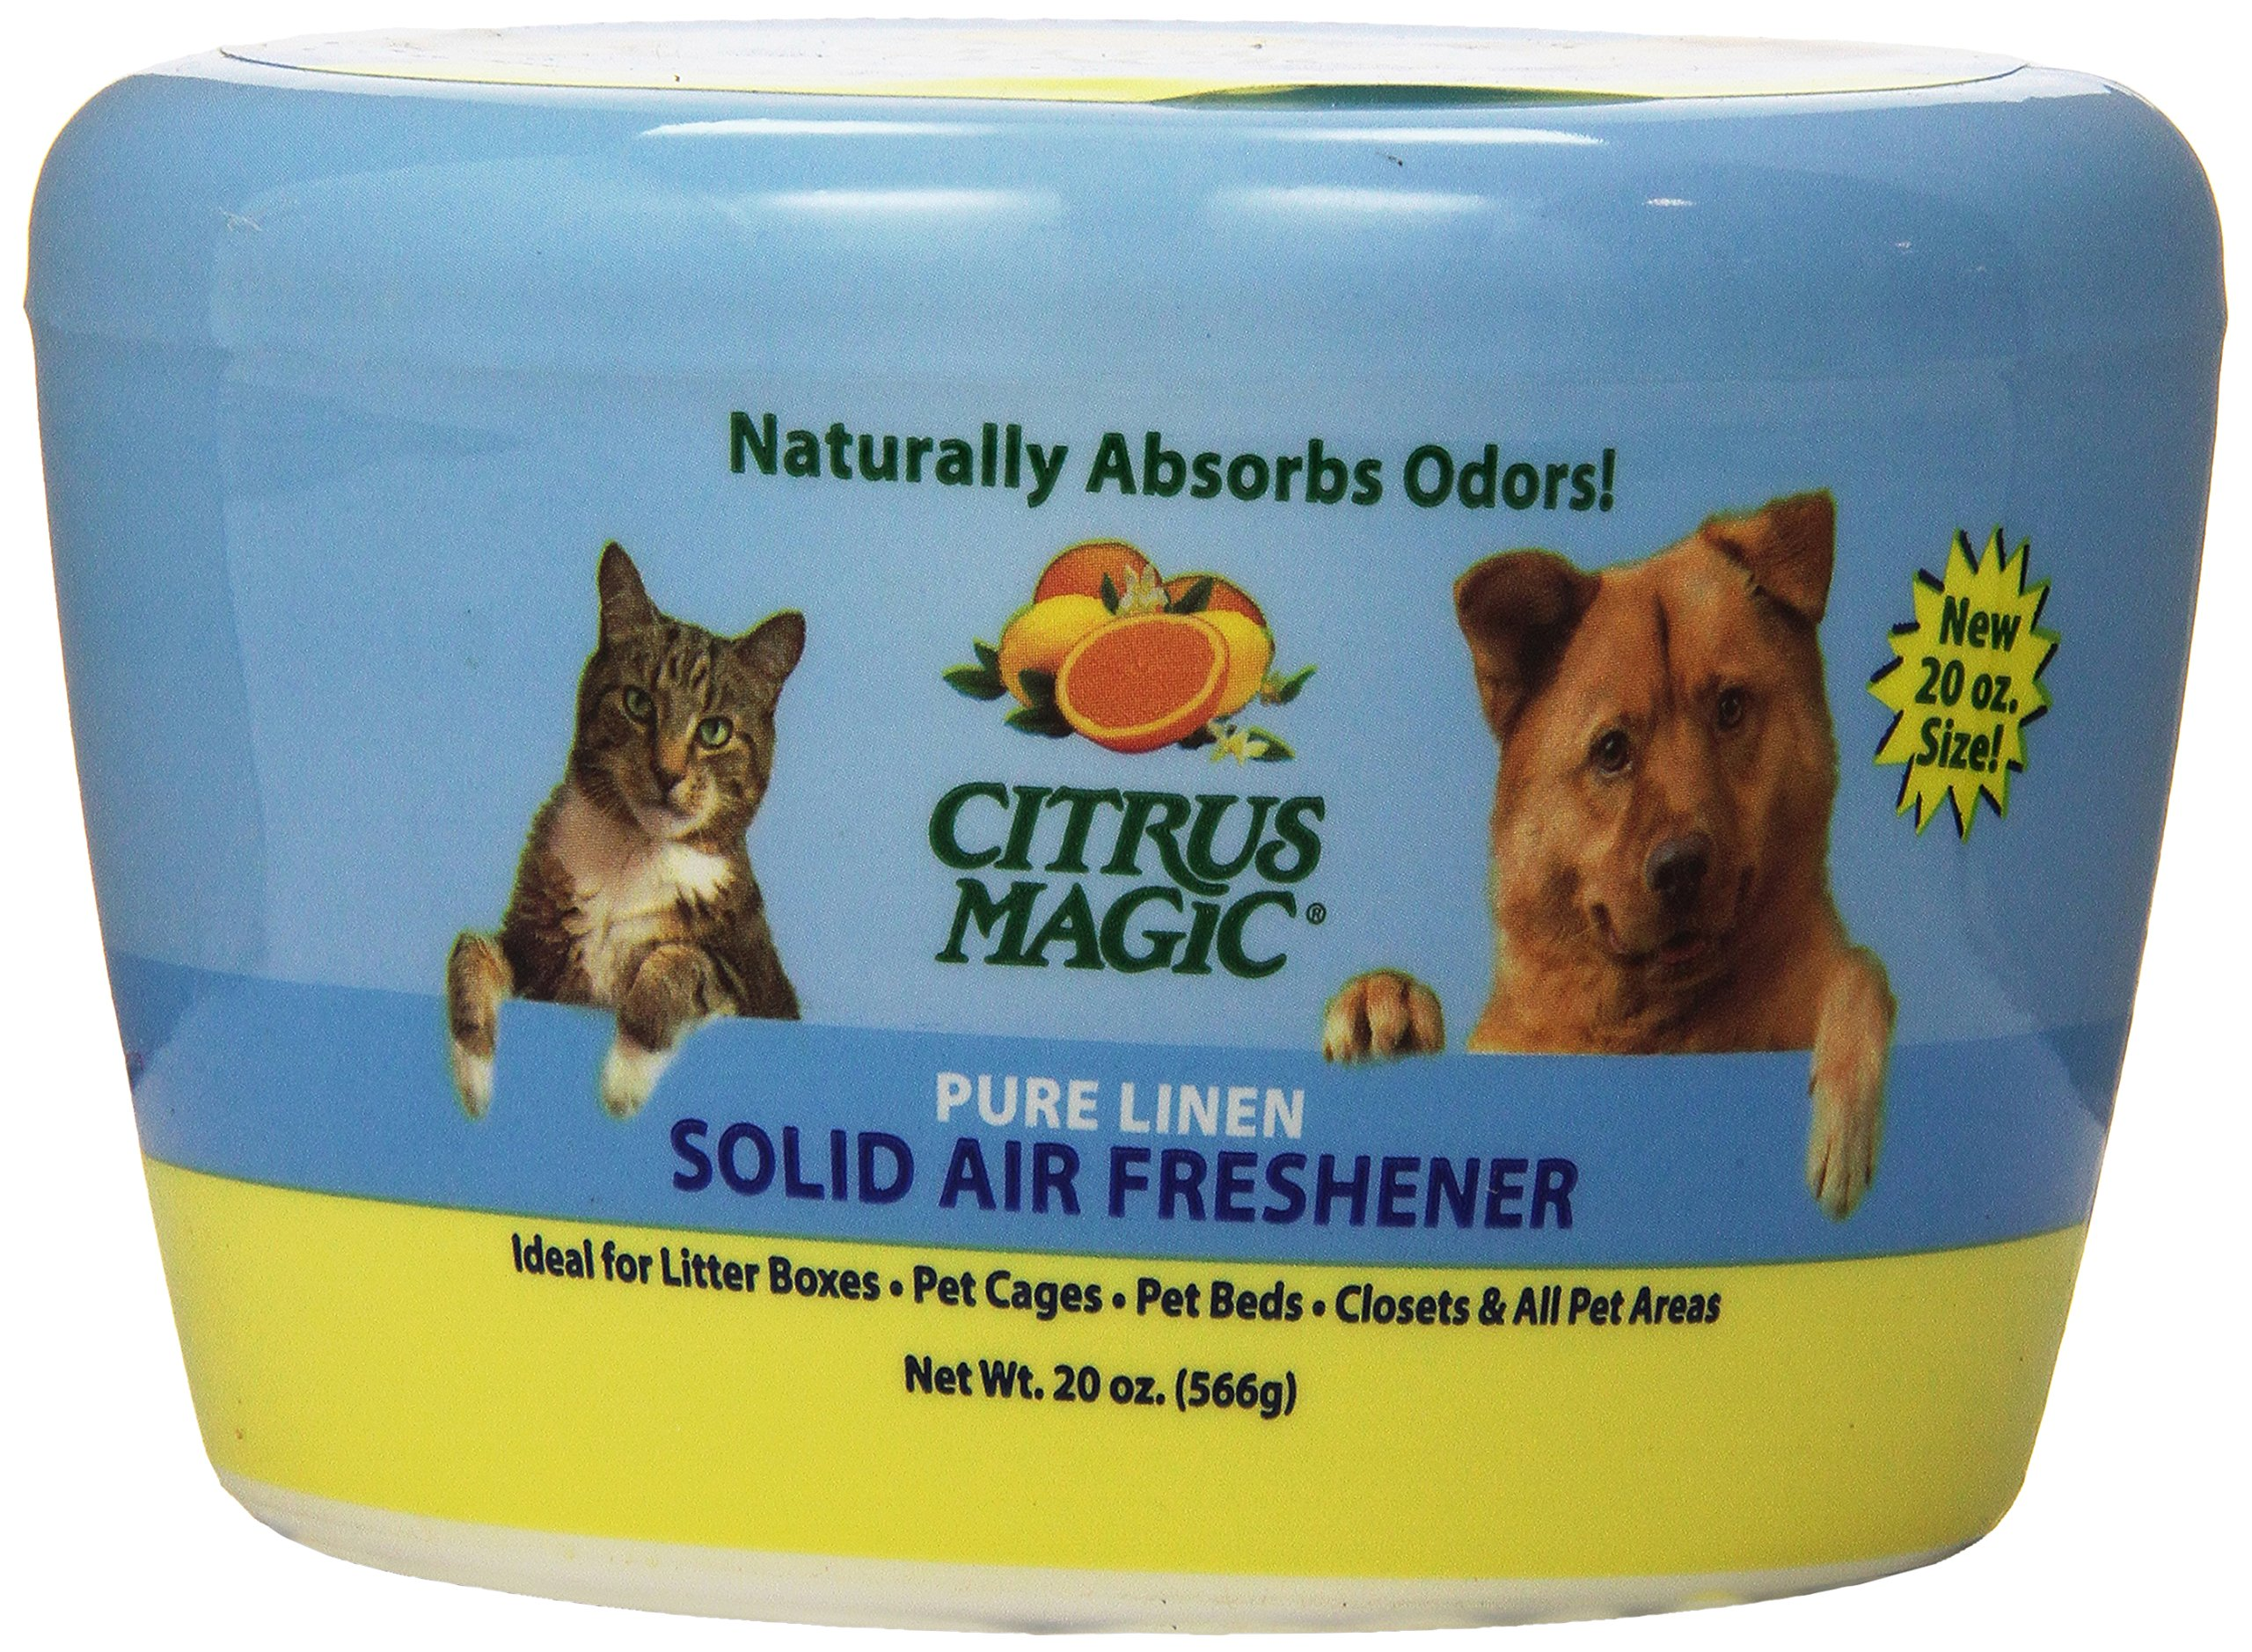 Citrus Magic Pet Odor Absorbing Solid Air Freshener Pure Linen, 20-Ounce